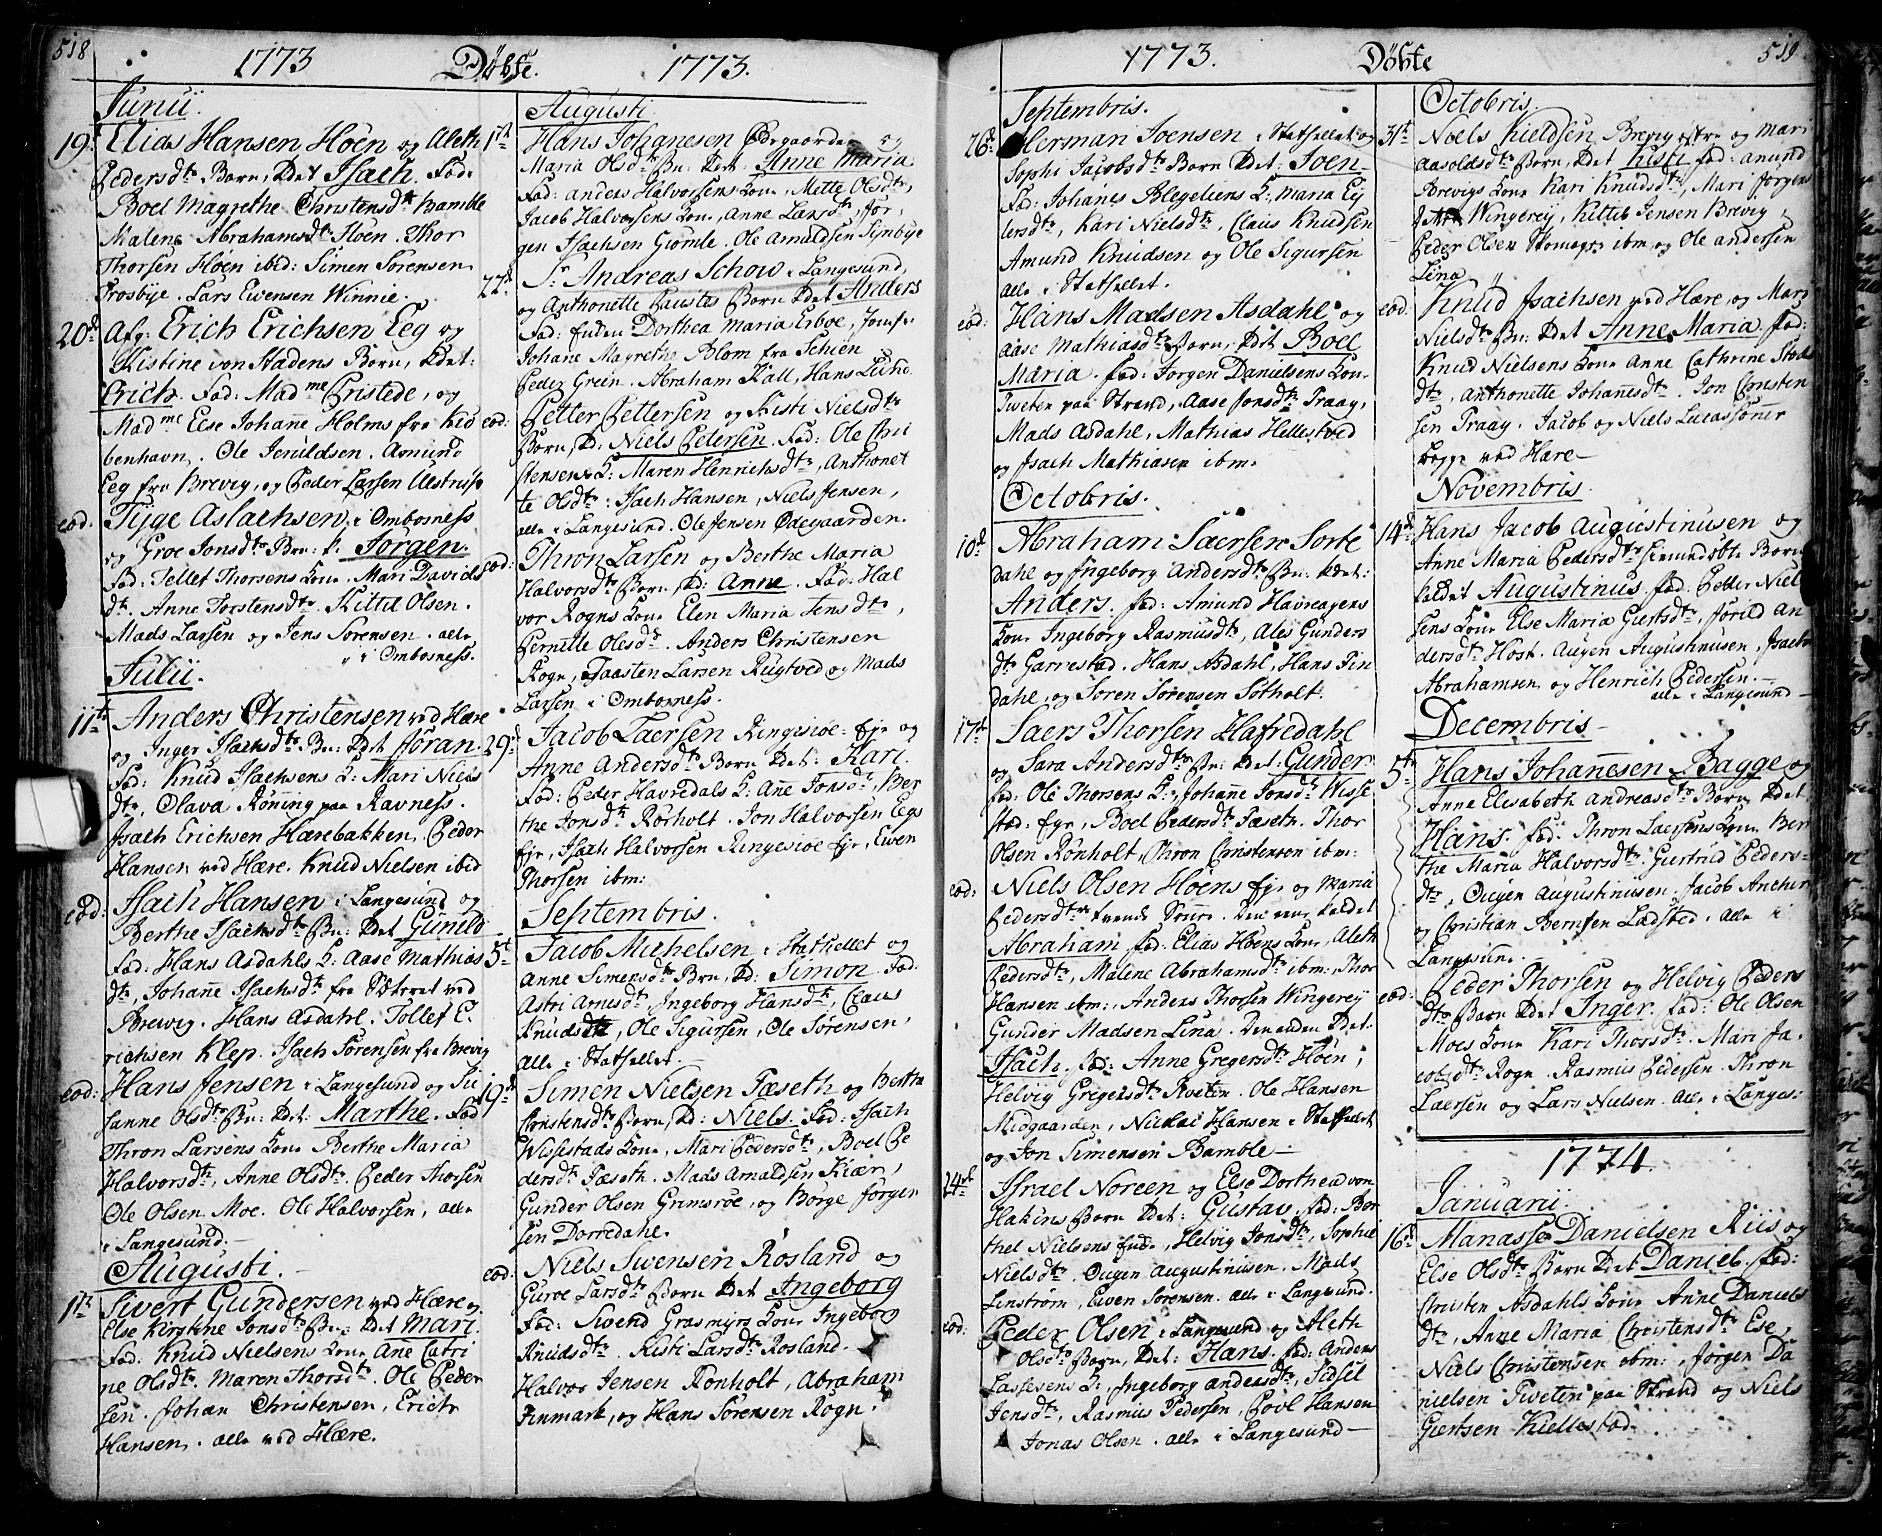 SAKO, Bamble kirkebøker, F/Fa/L0001: Ministerialbok nr. I 1, 1702-1774, s. 518-519